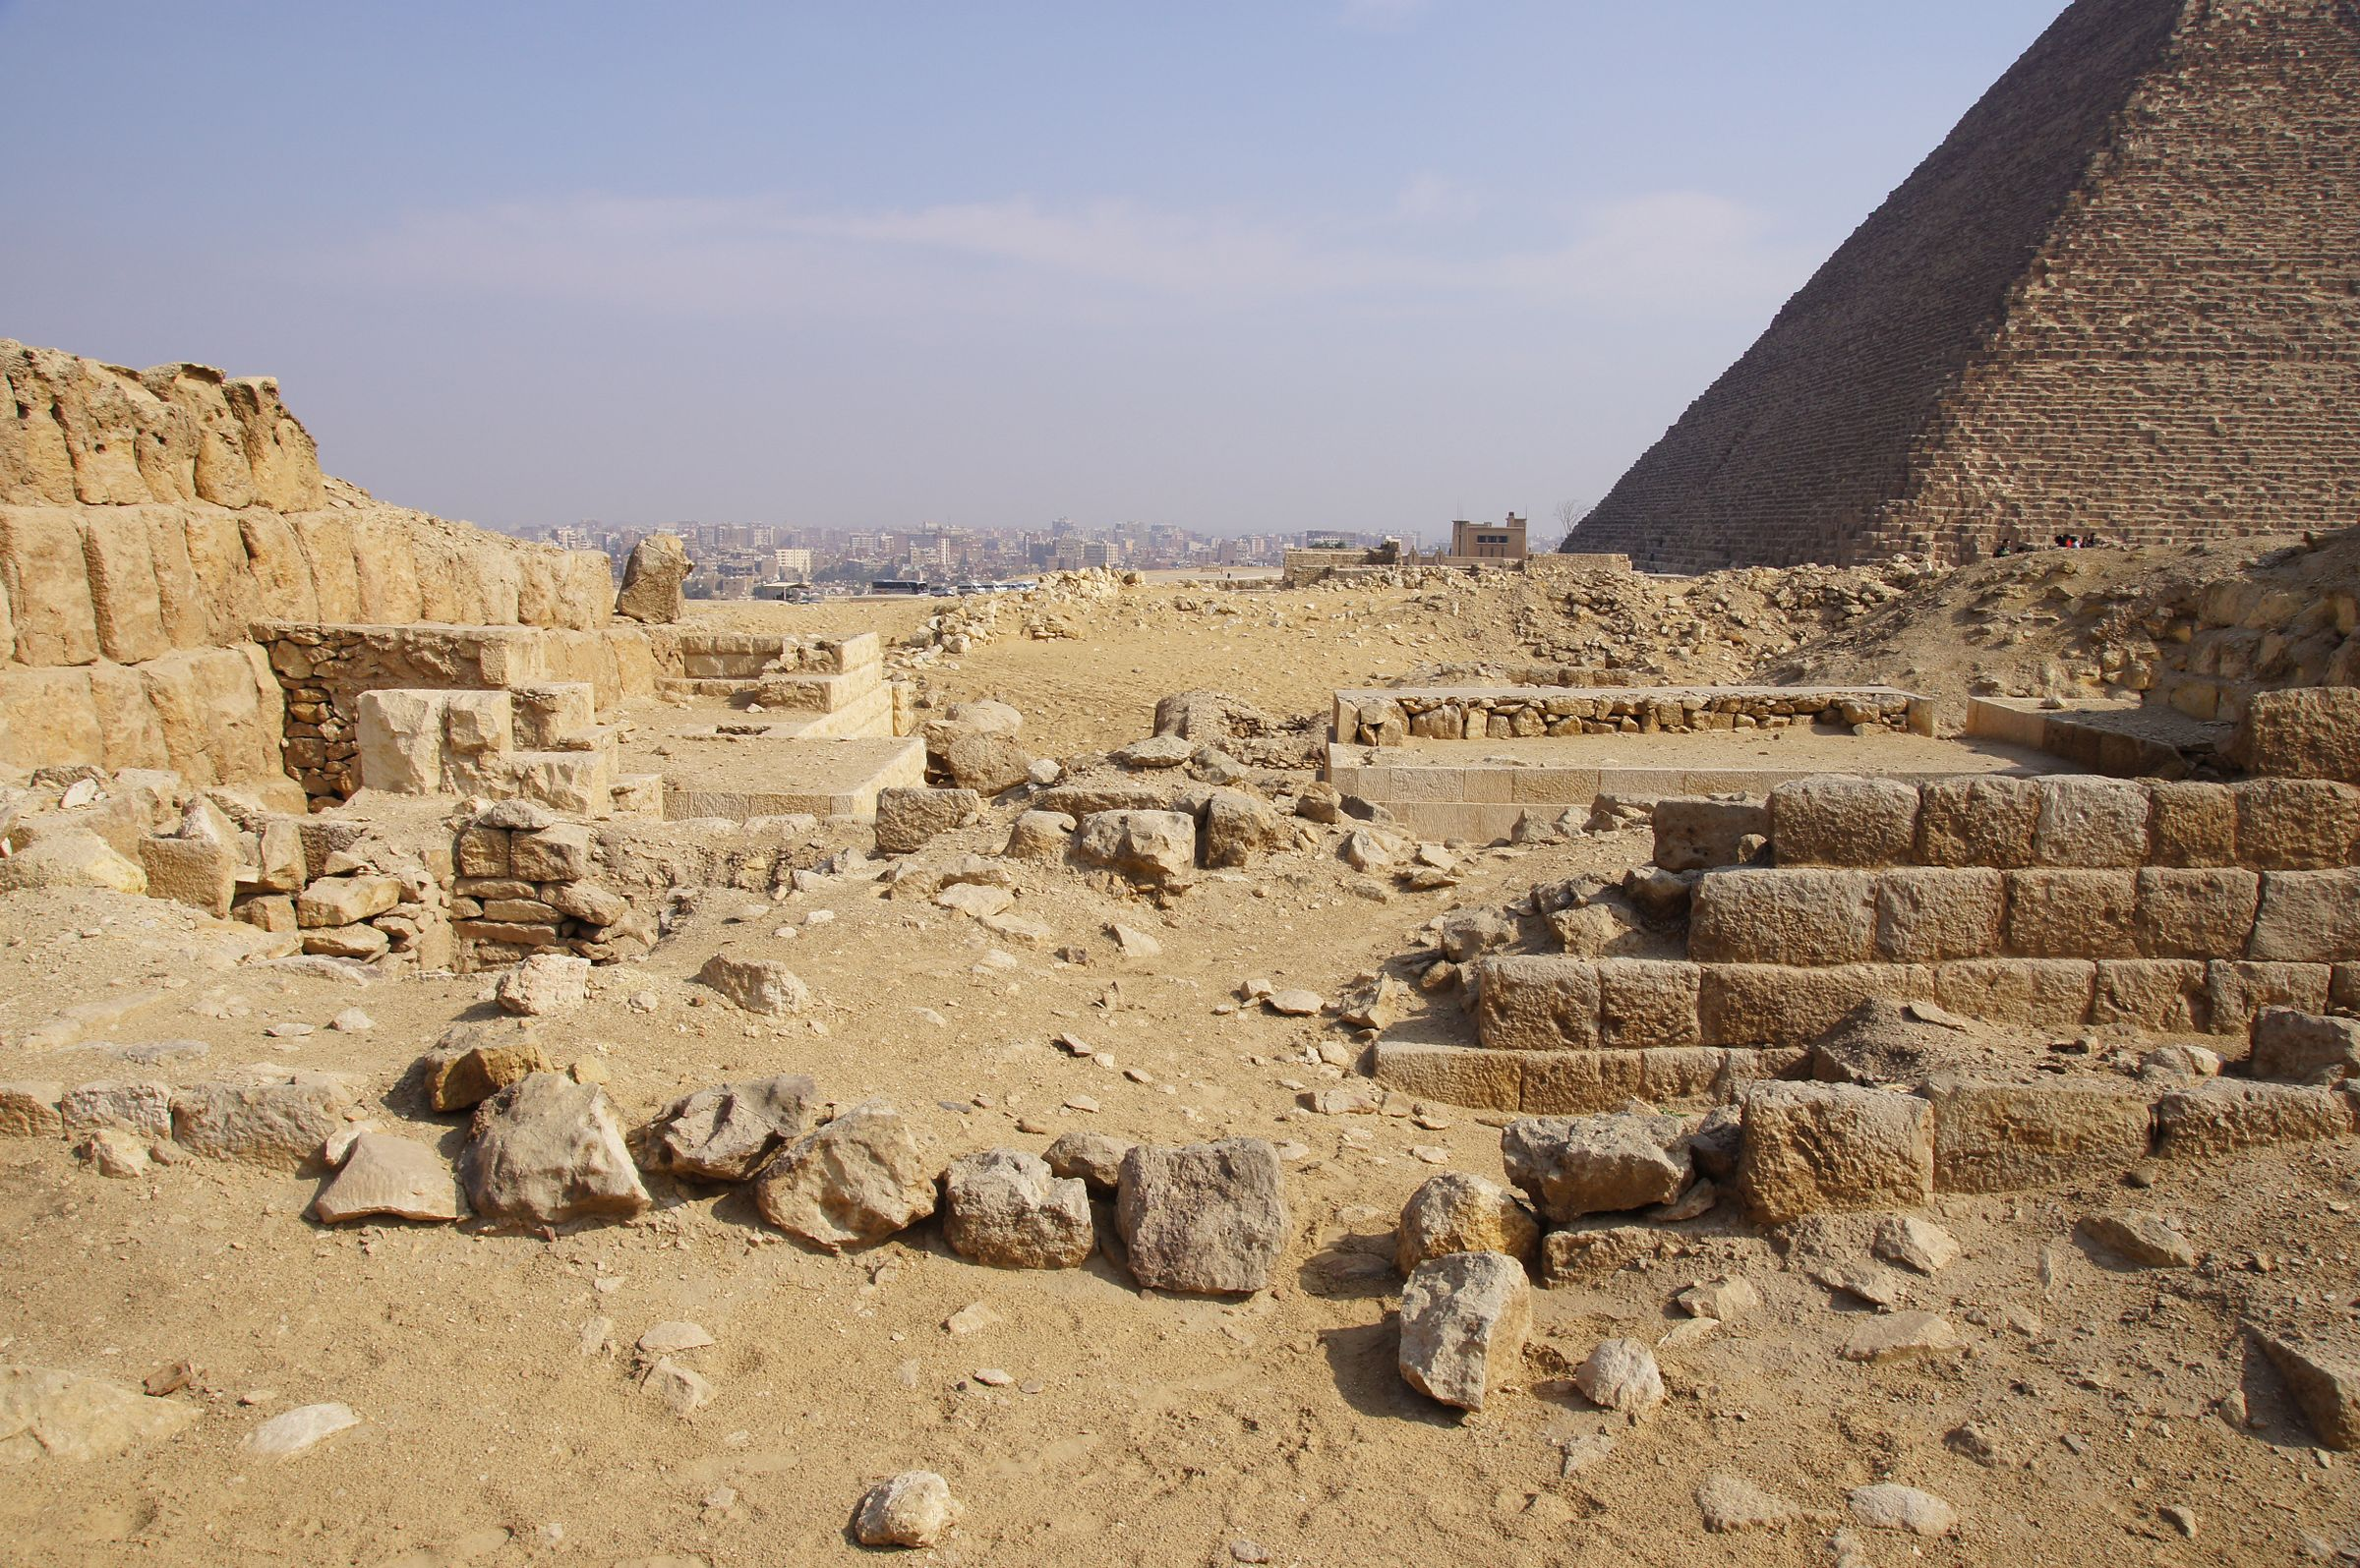 Western Cemetery: Site: Giza; View: G 2220, G 2150, G 2134, G 2137, G 2138, G 2139, G 2151, G 2156'